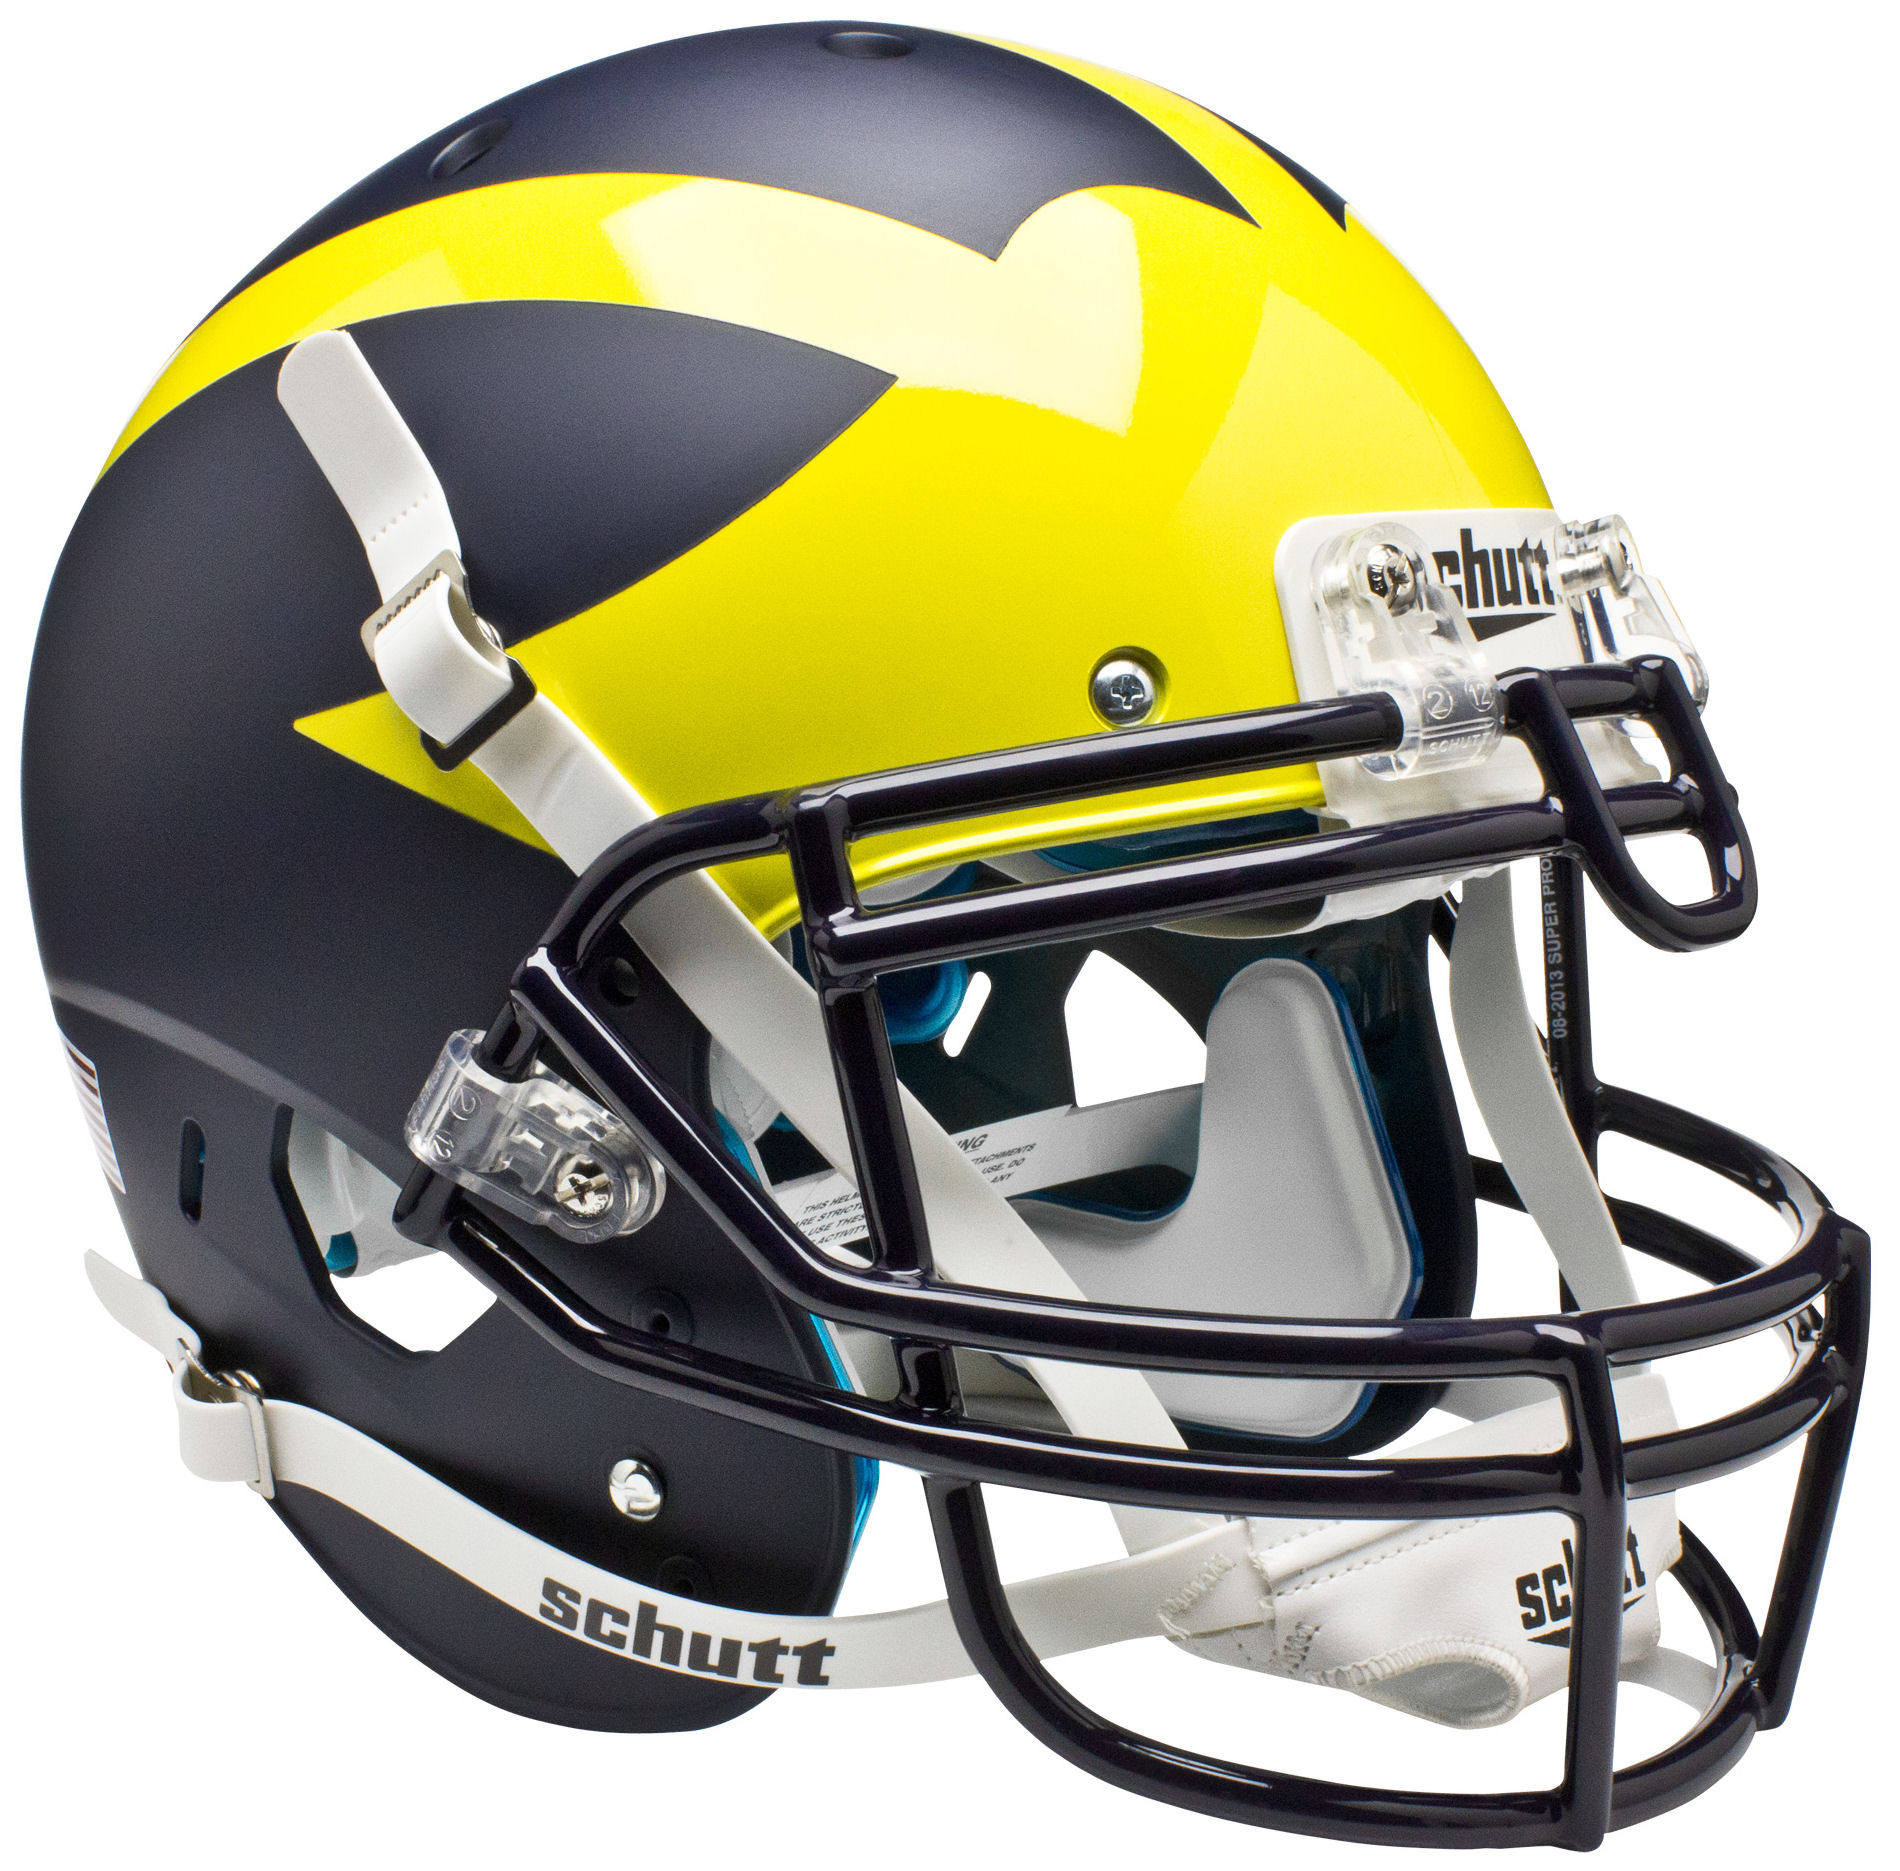 Michigan Wolverines Authentic College Xp Football Helmet Schutt Matte Blue Football Helmets College Football Helmets Football